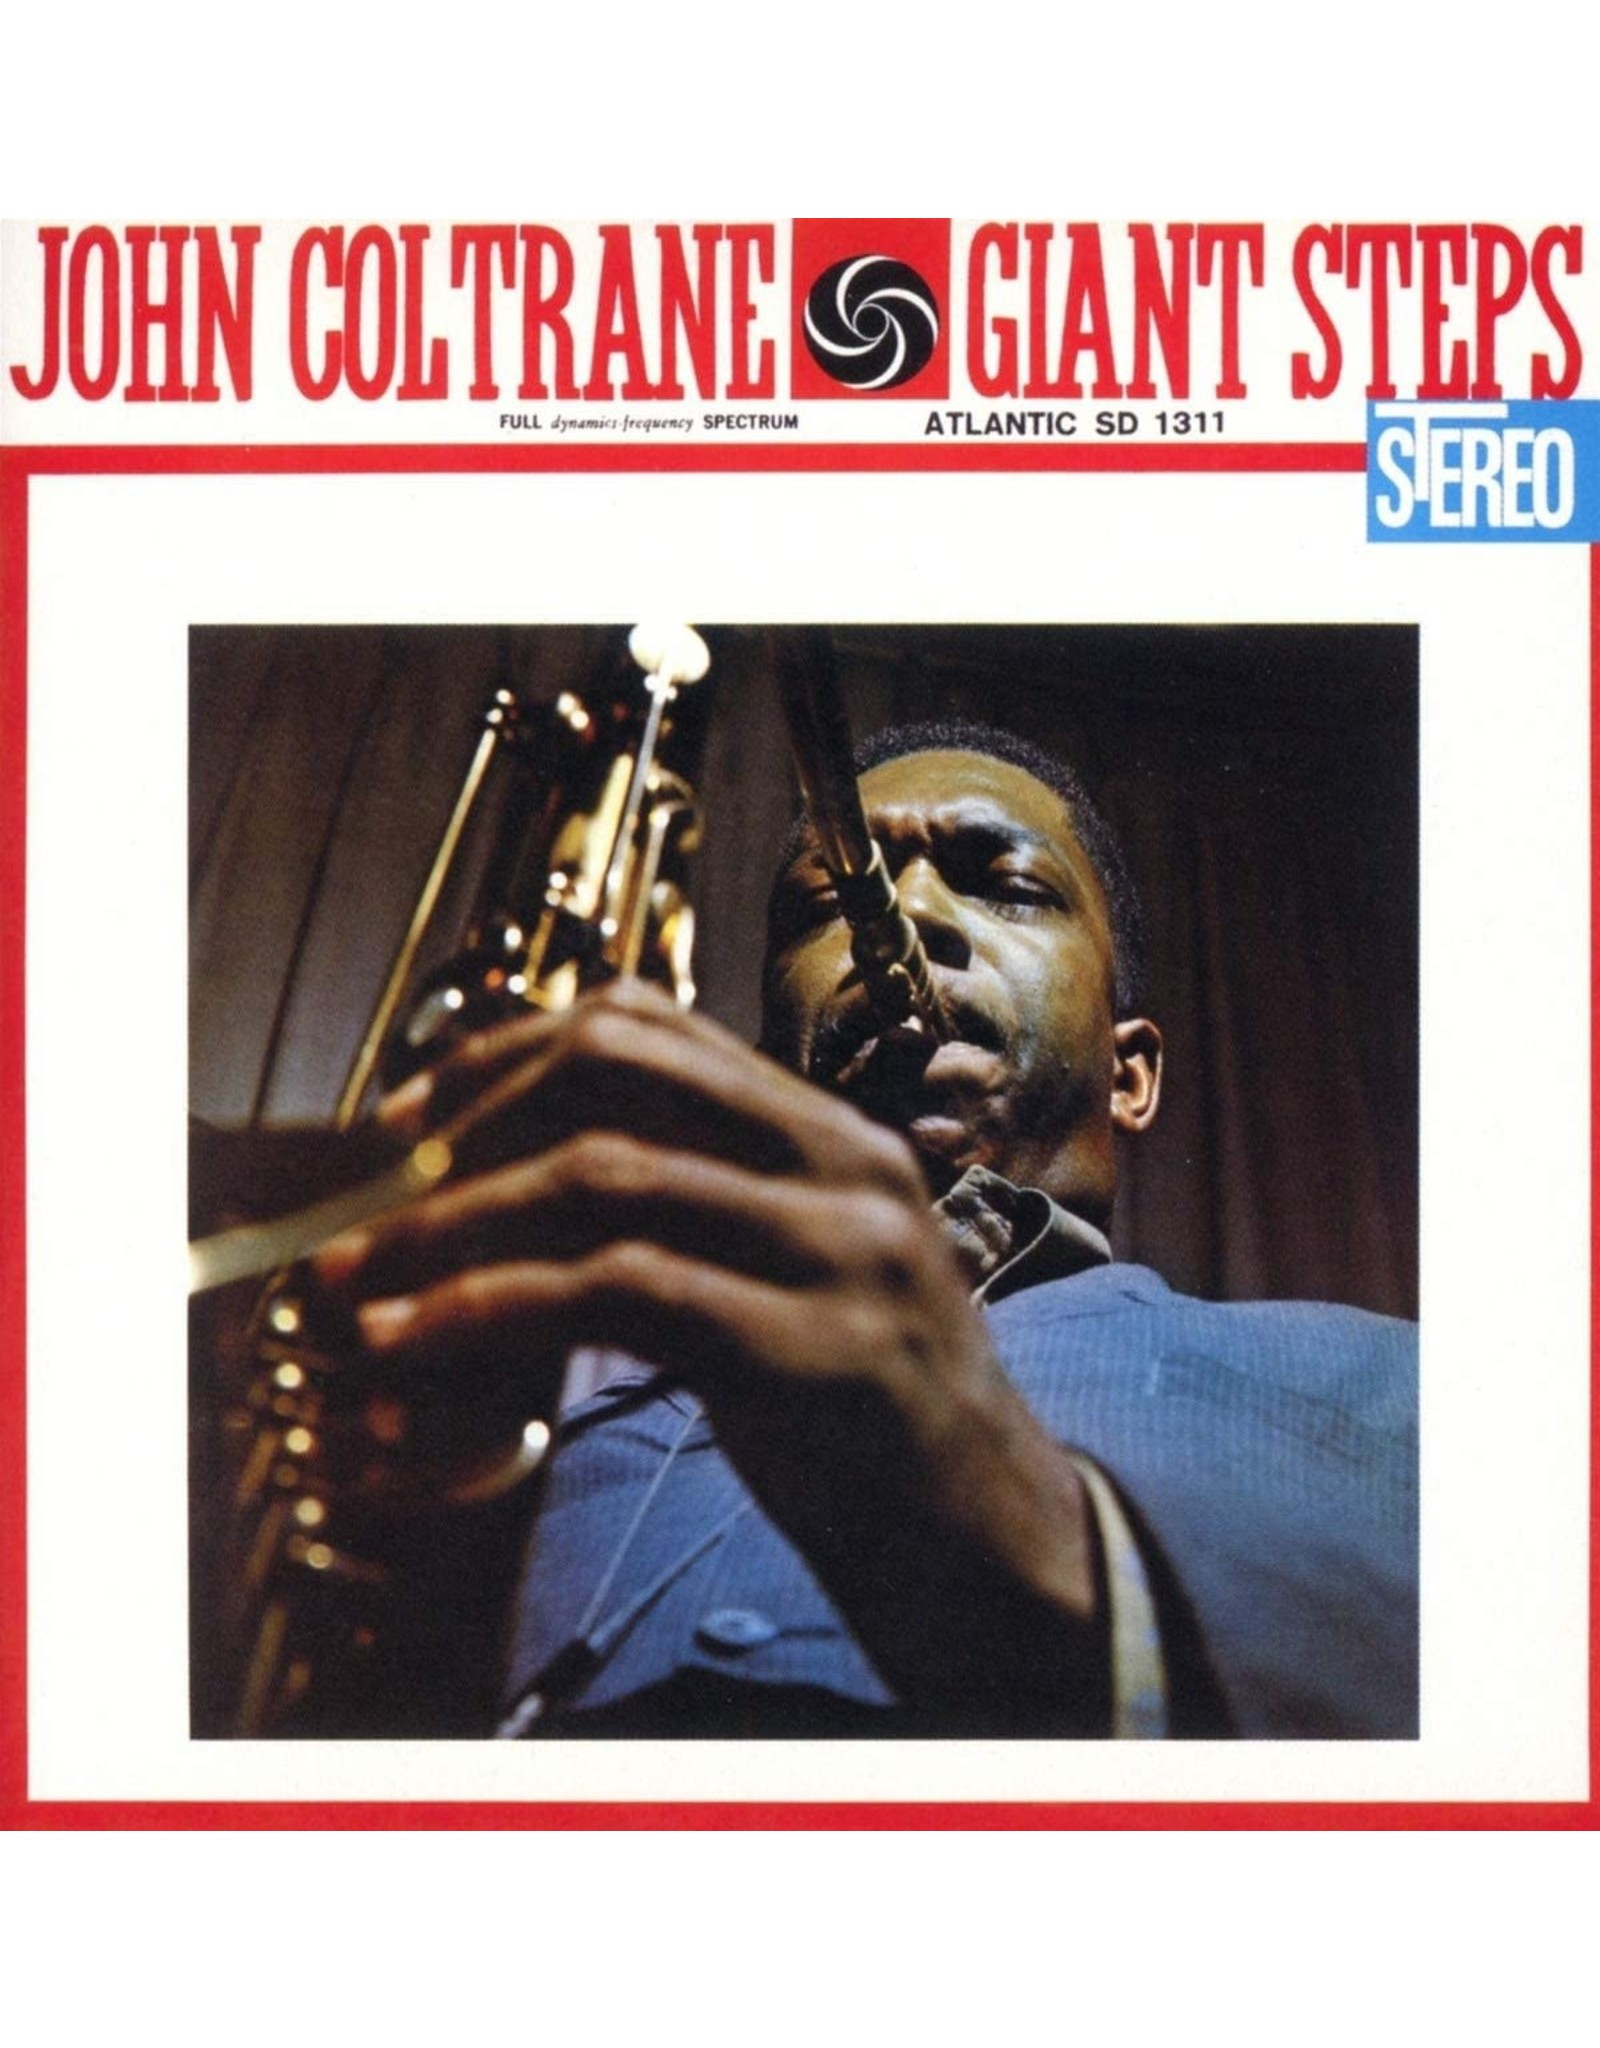 John Coltrane - Giant Steps (60th Anniversary) [Deluxe Edition]